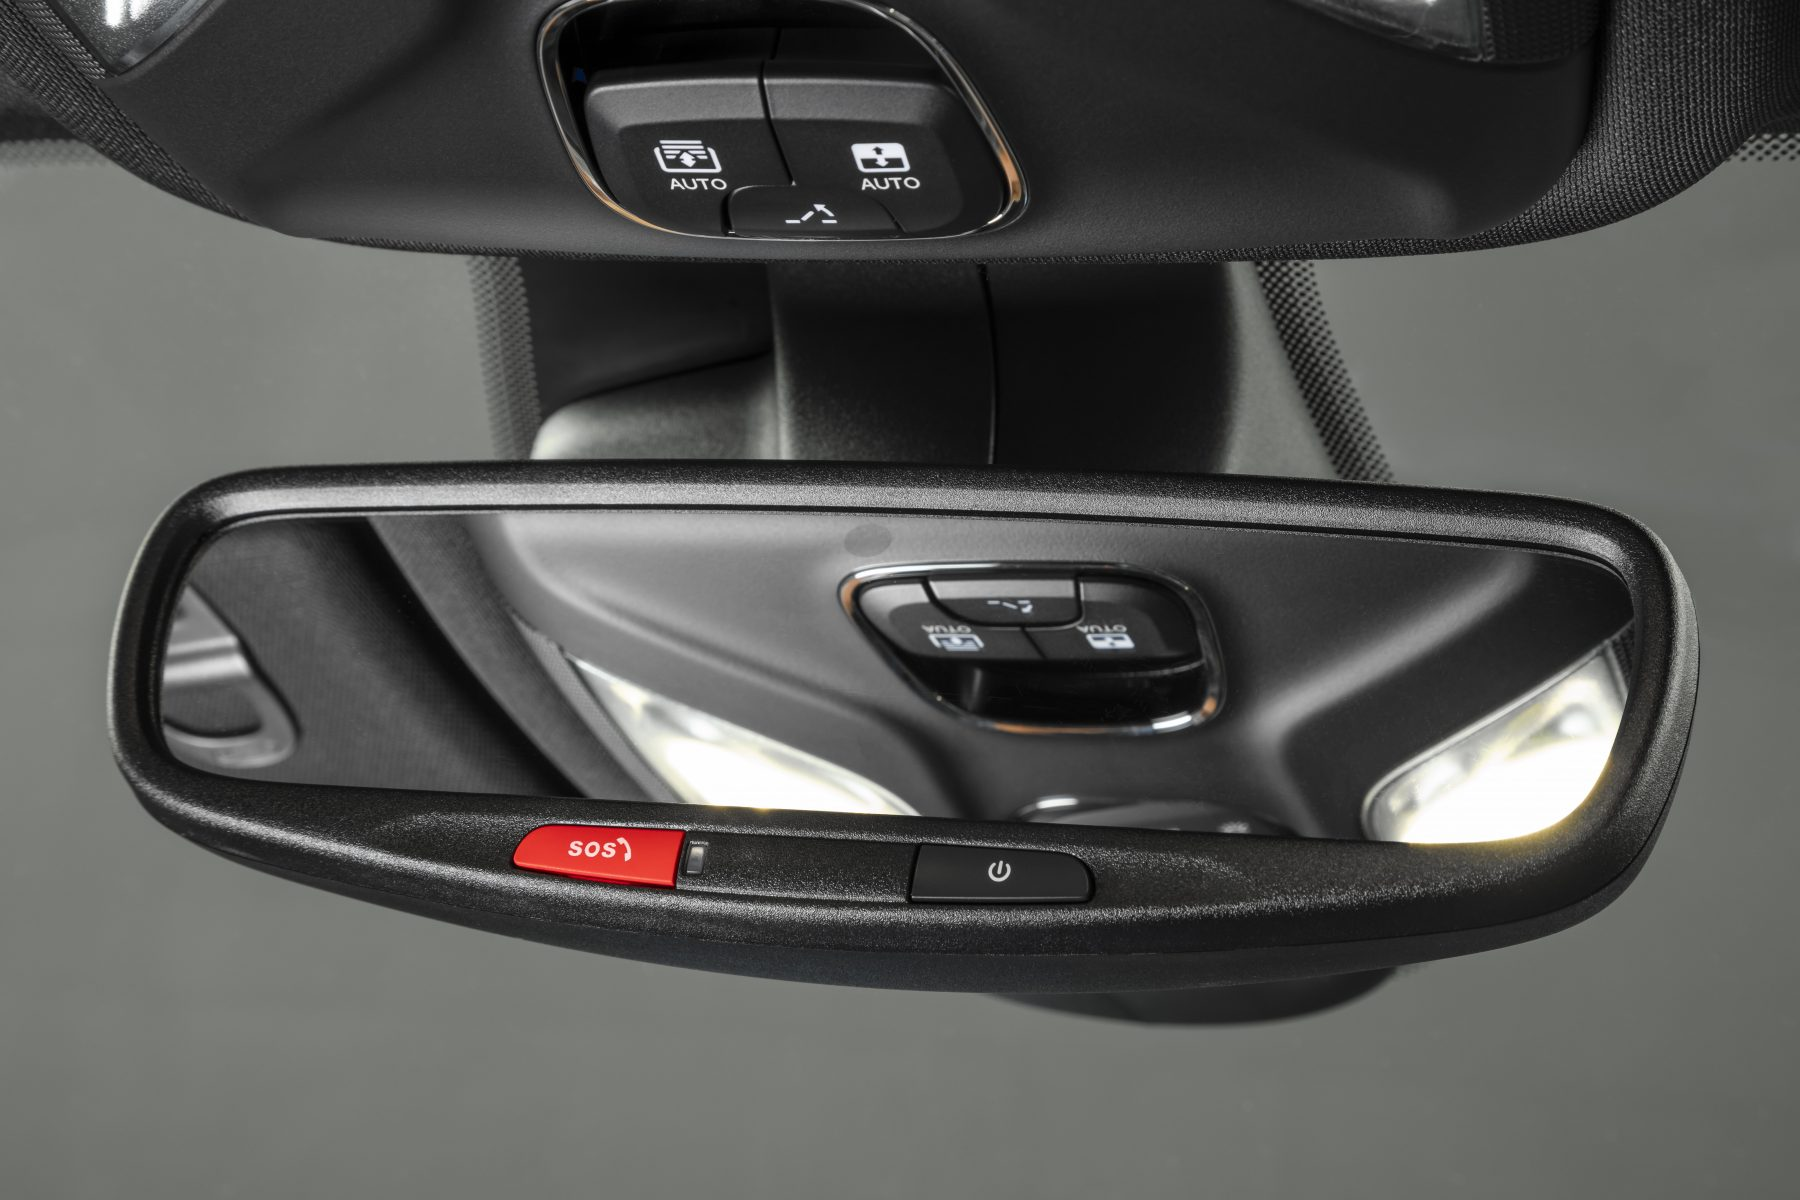 jeep compass s 2022 8